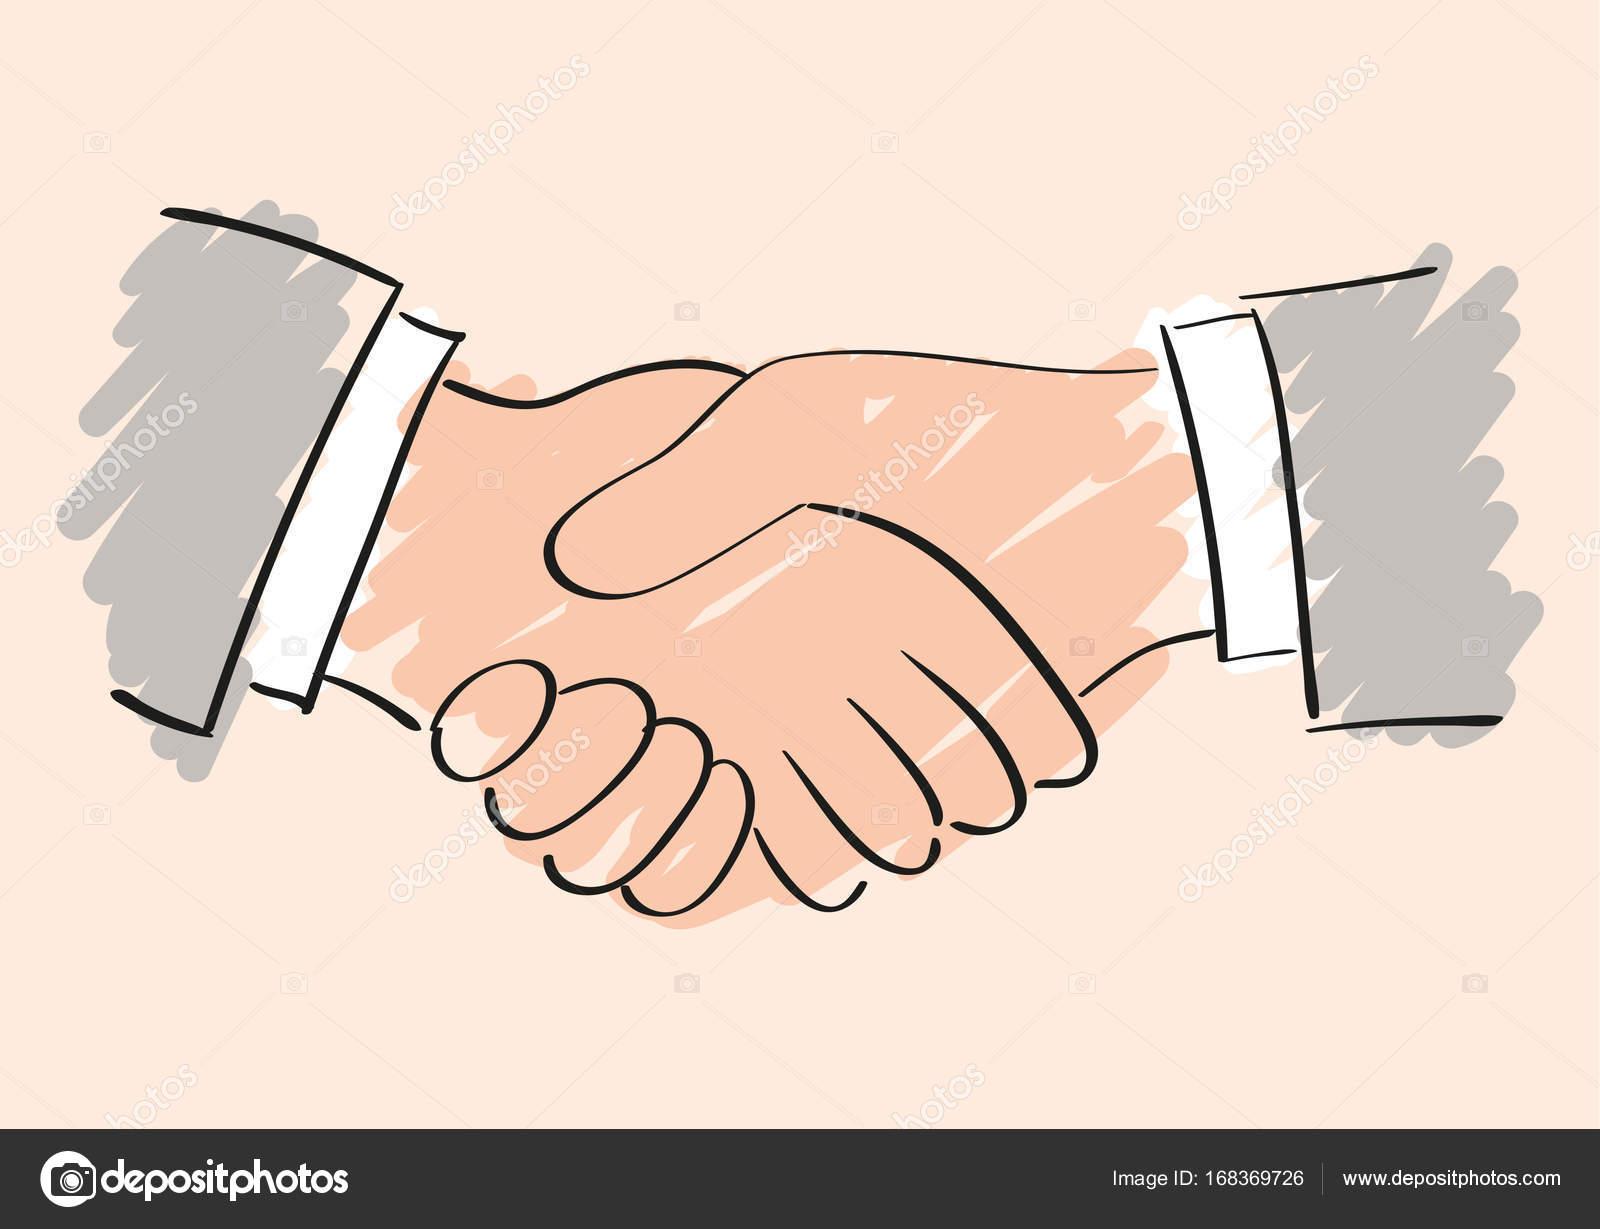 1600x1229 Vector Sketch Drawing Of Handshake. Symbol Of Friendship